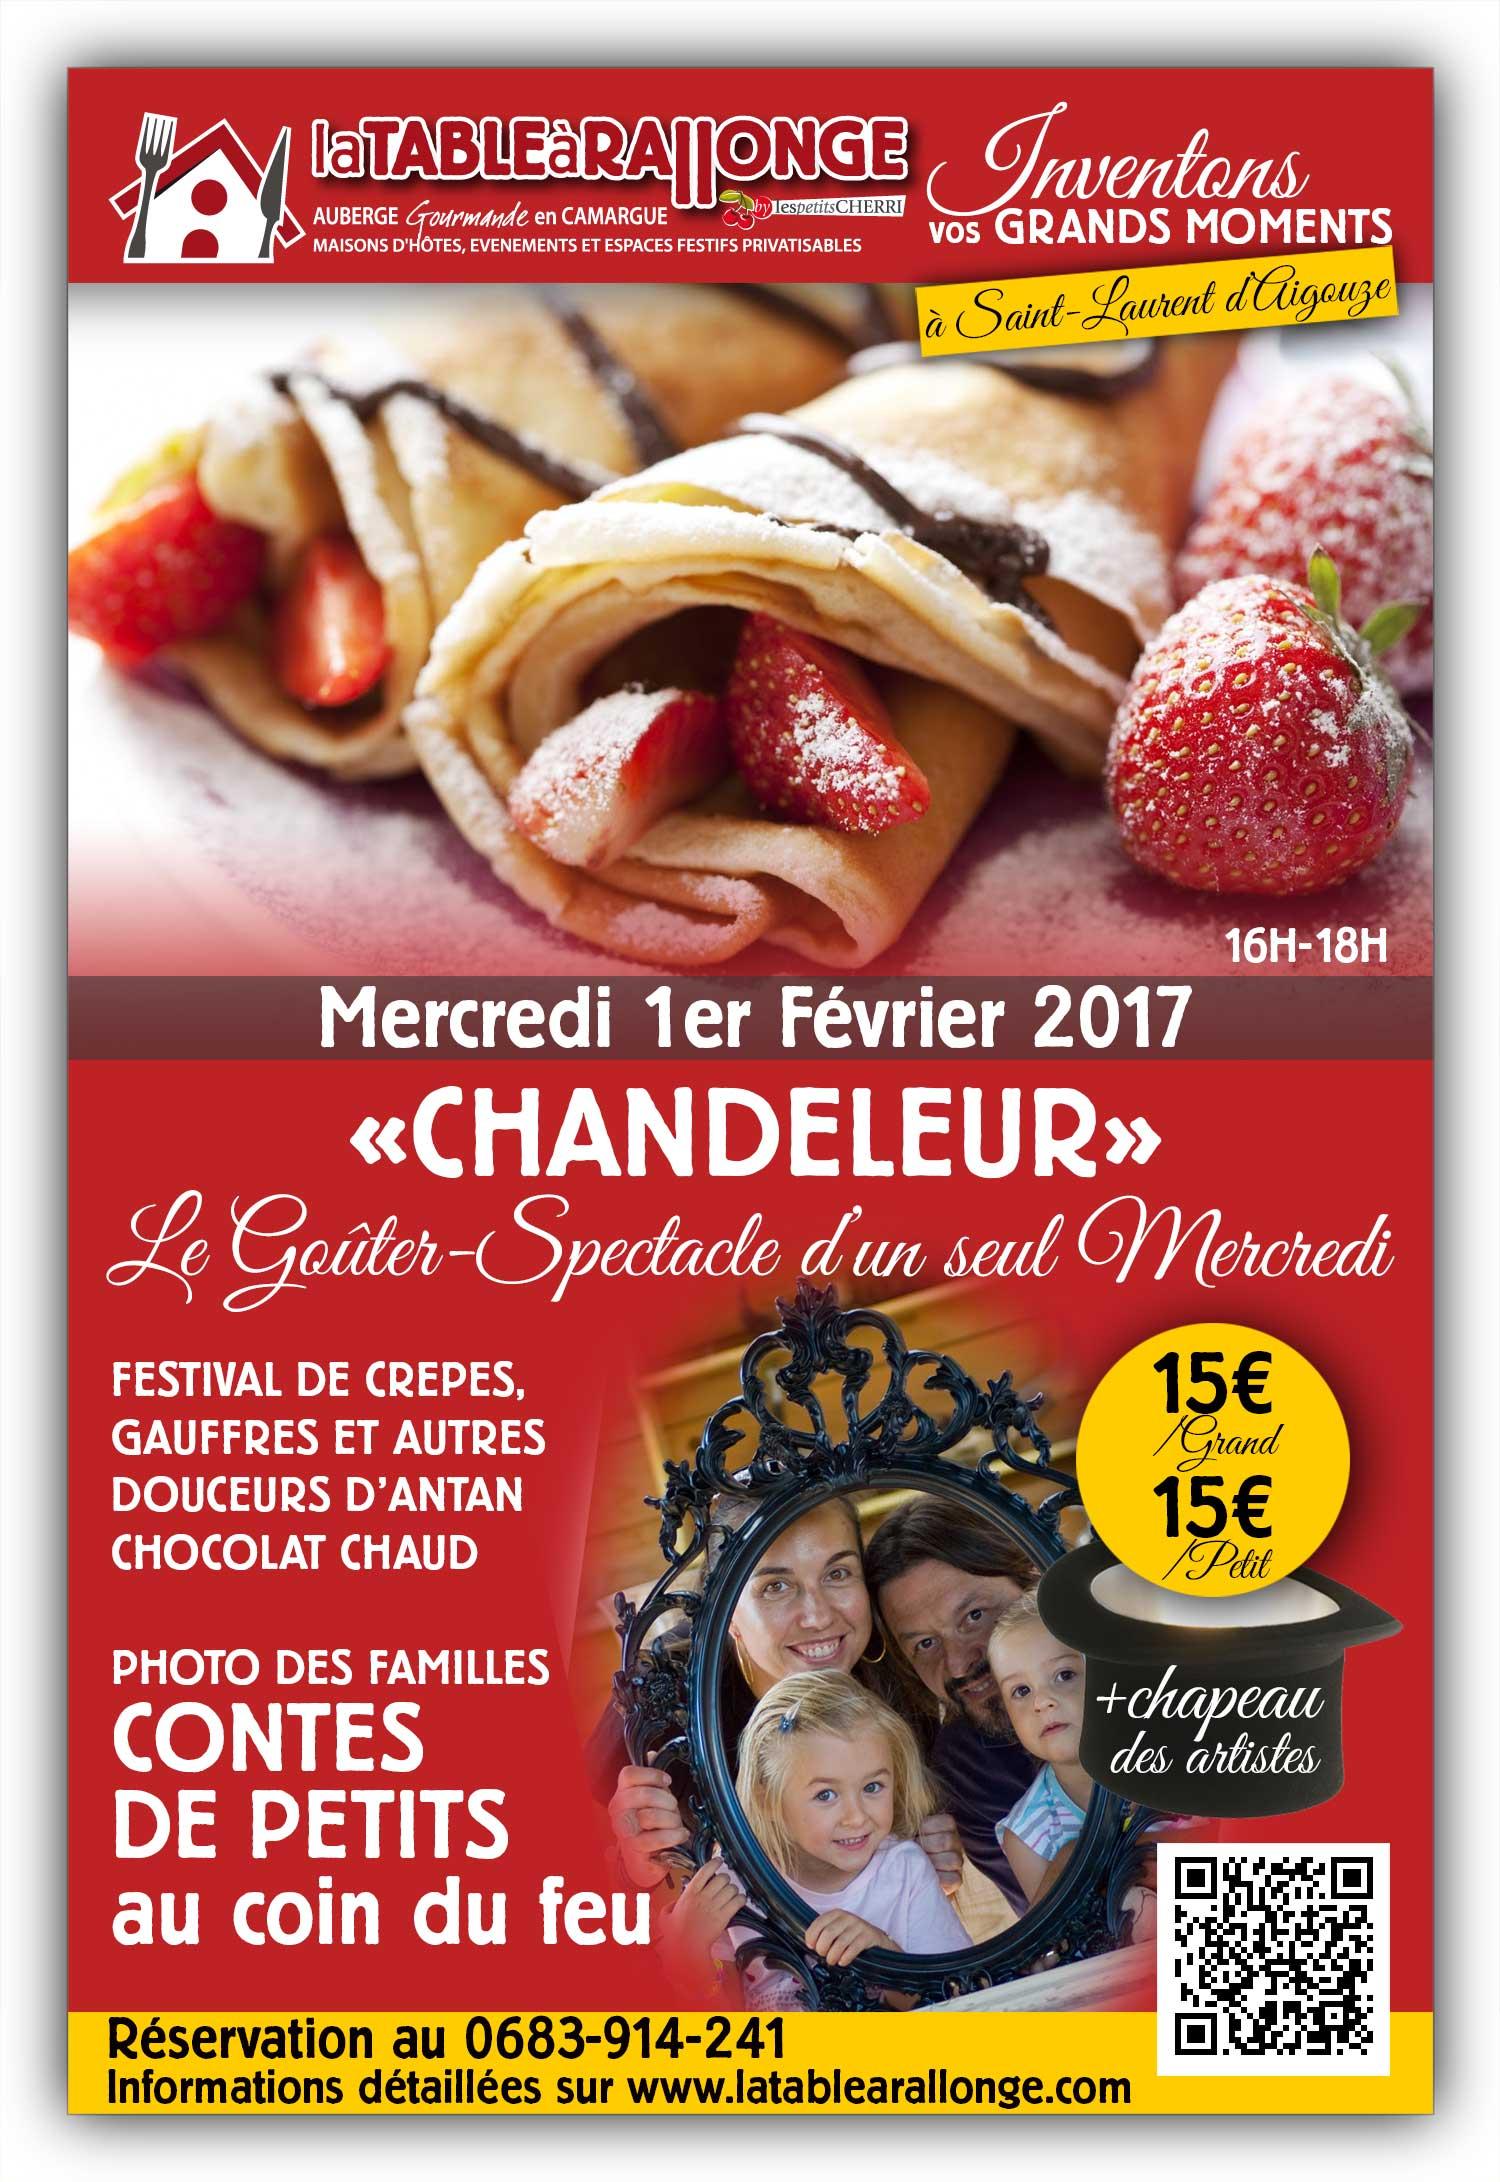 Goûter spectacle Chandeleur en Camargue